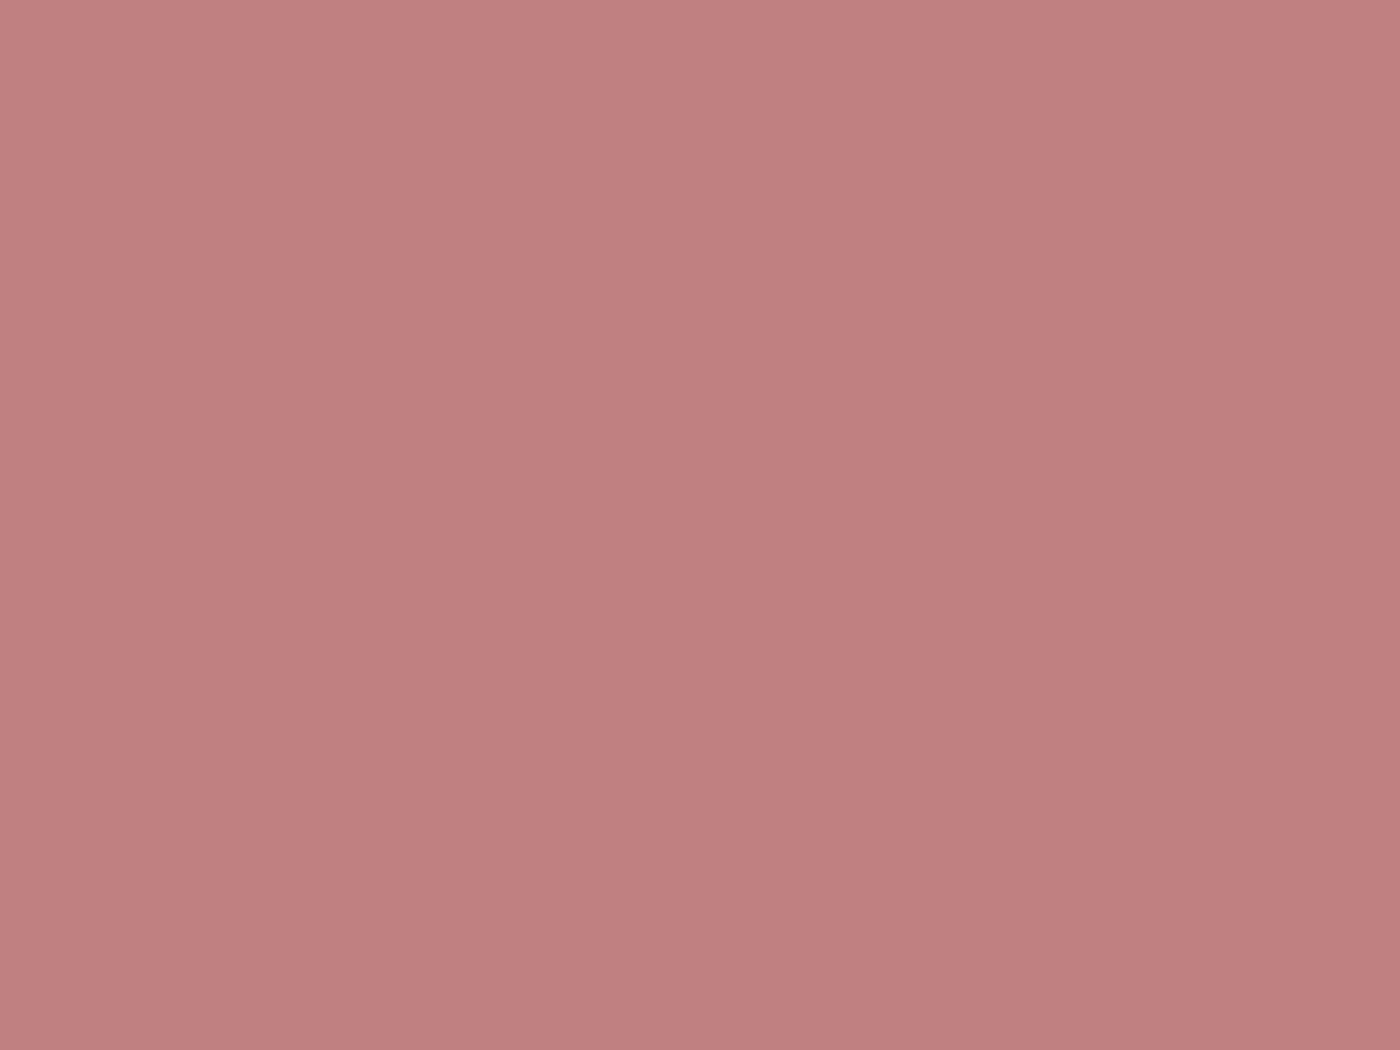 1400x1050 Old Rose Solid Color Background